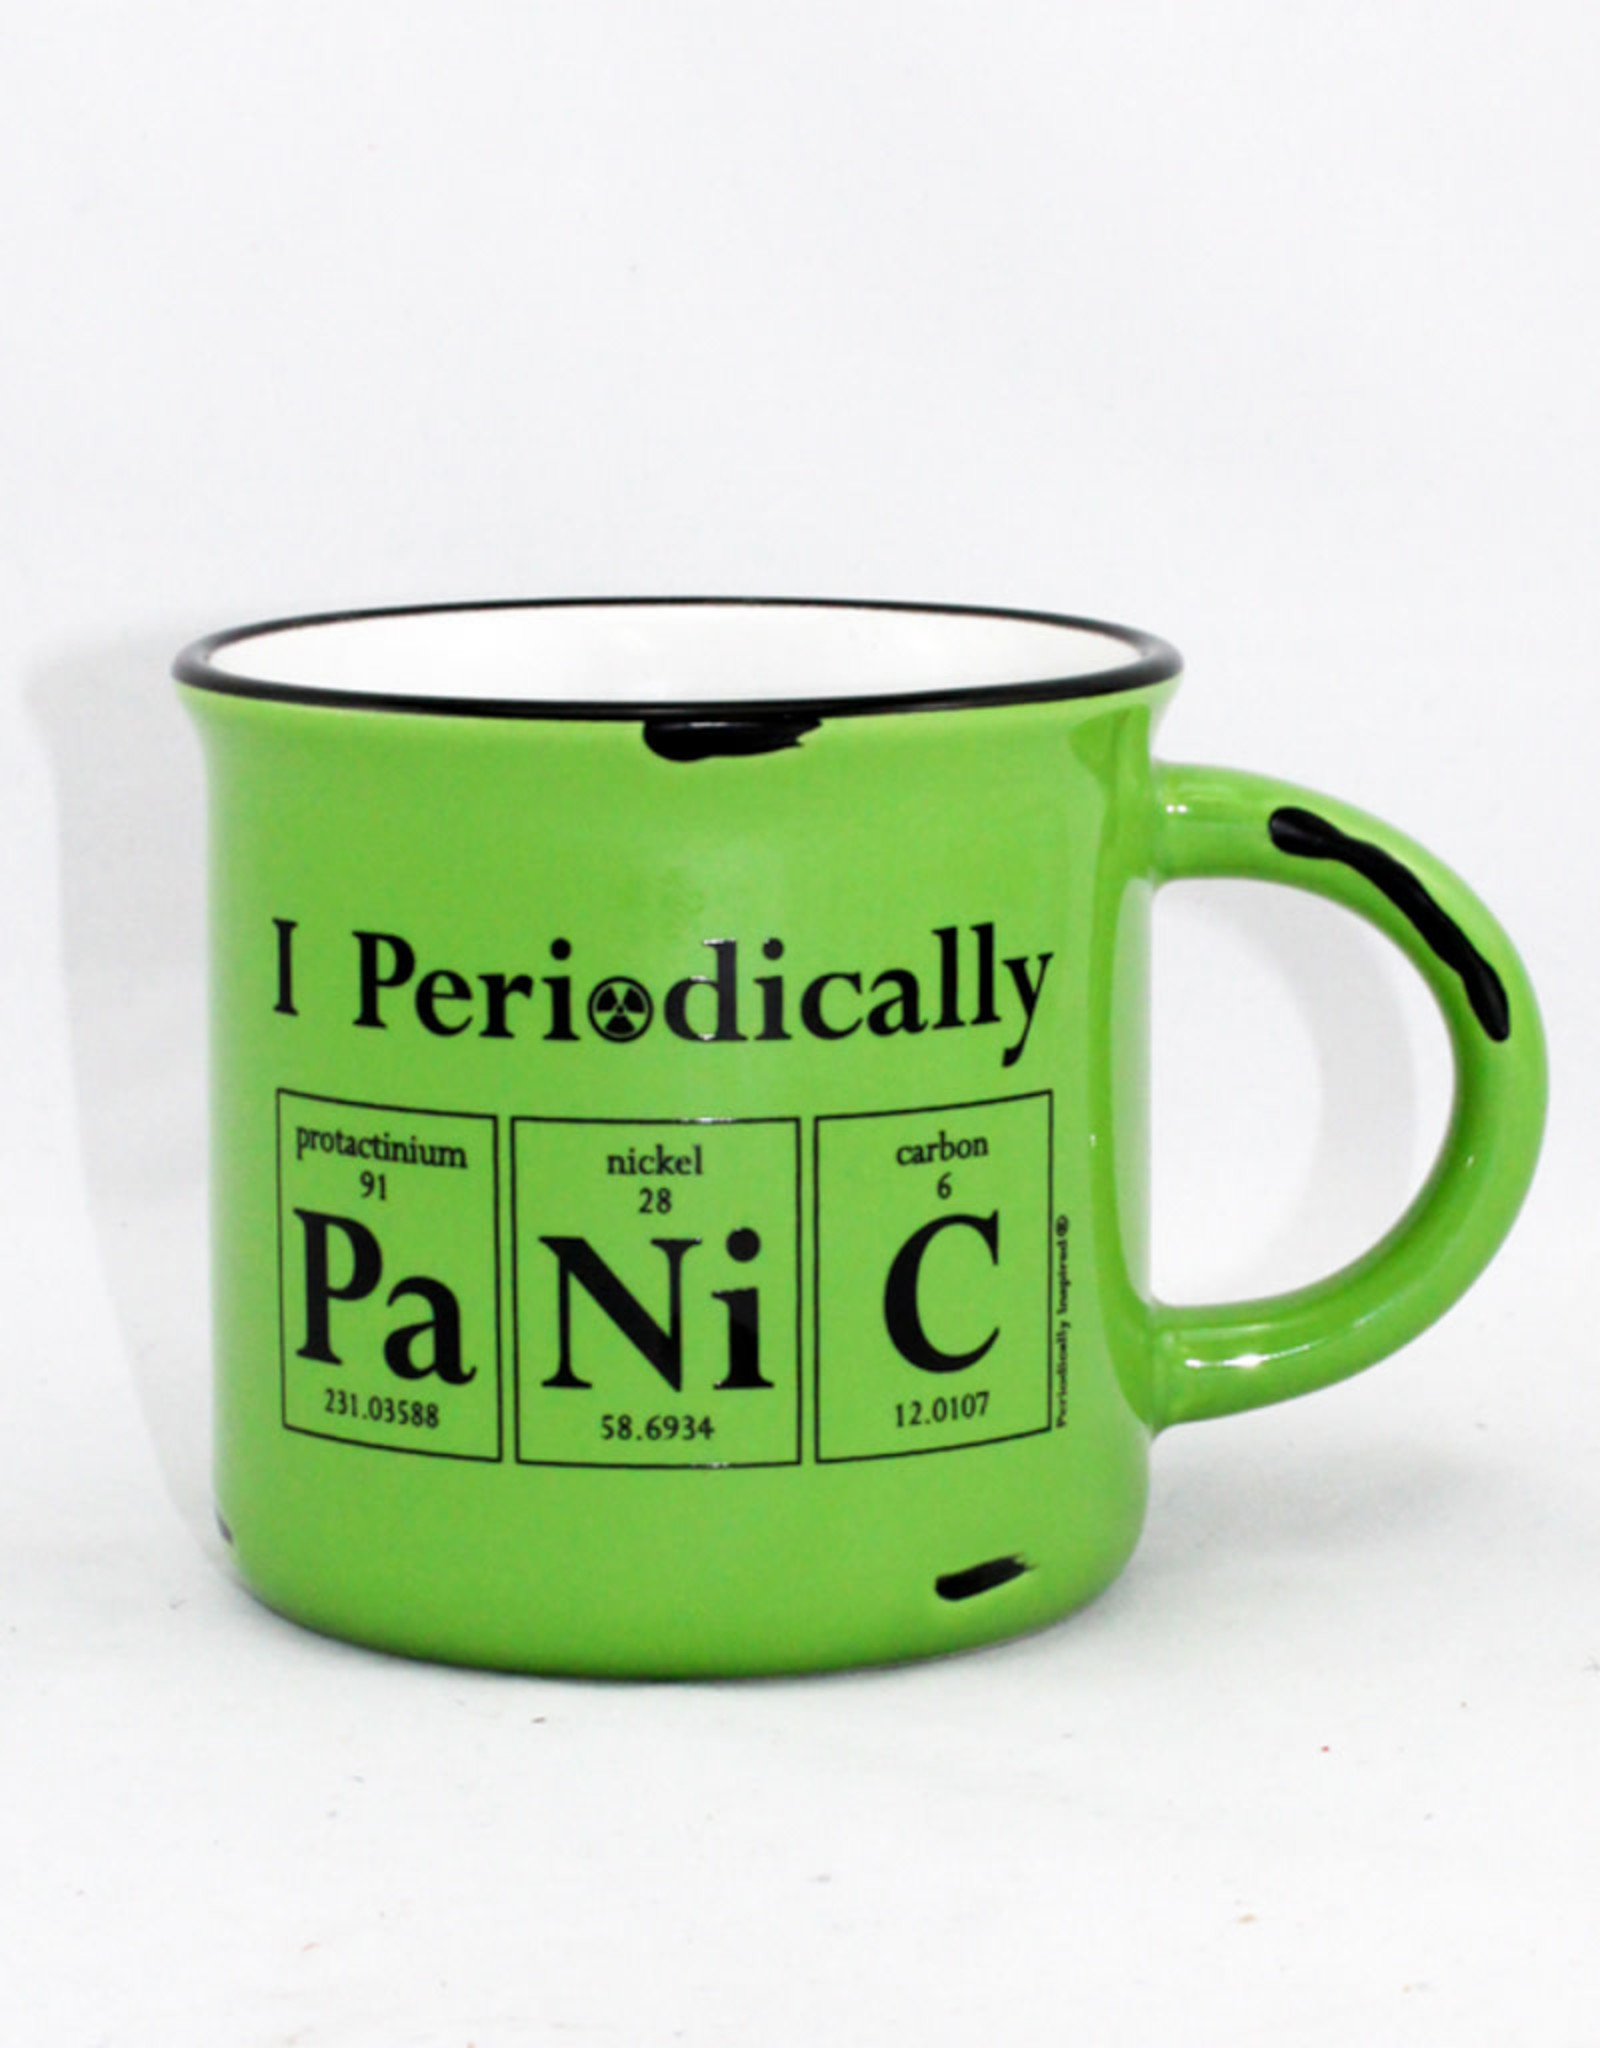 Periodically Inspired Mug-I Panic Periodically